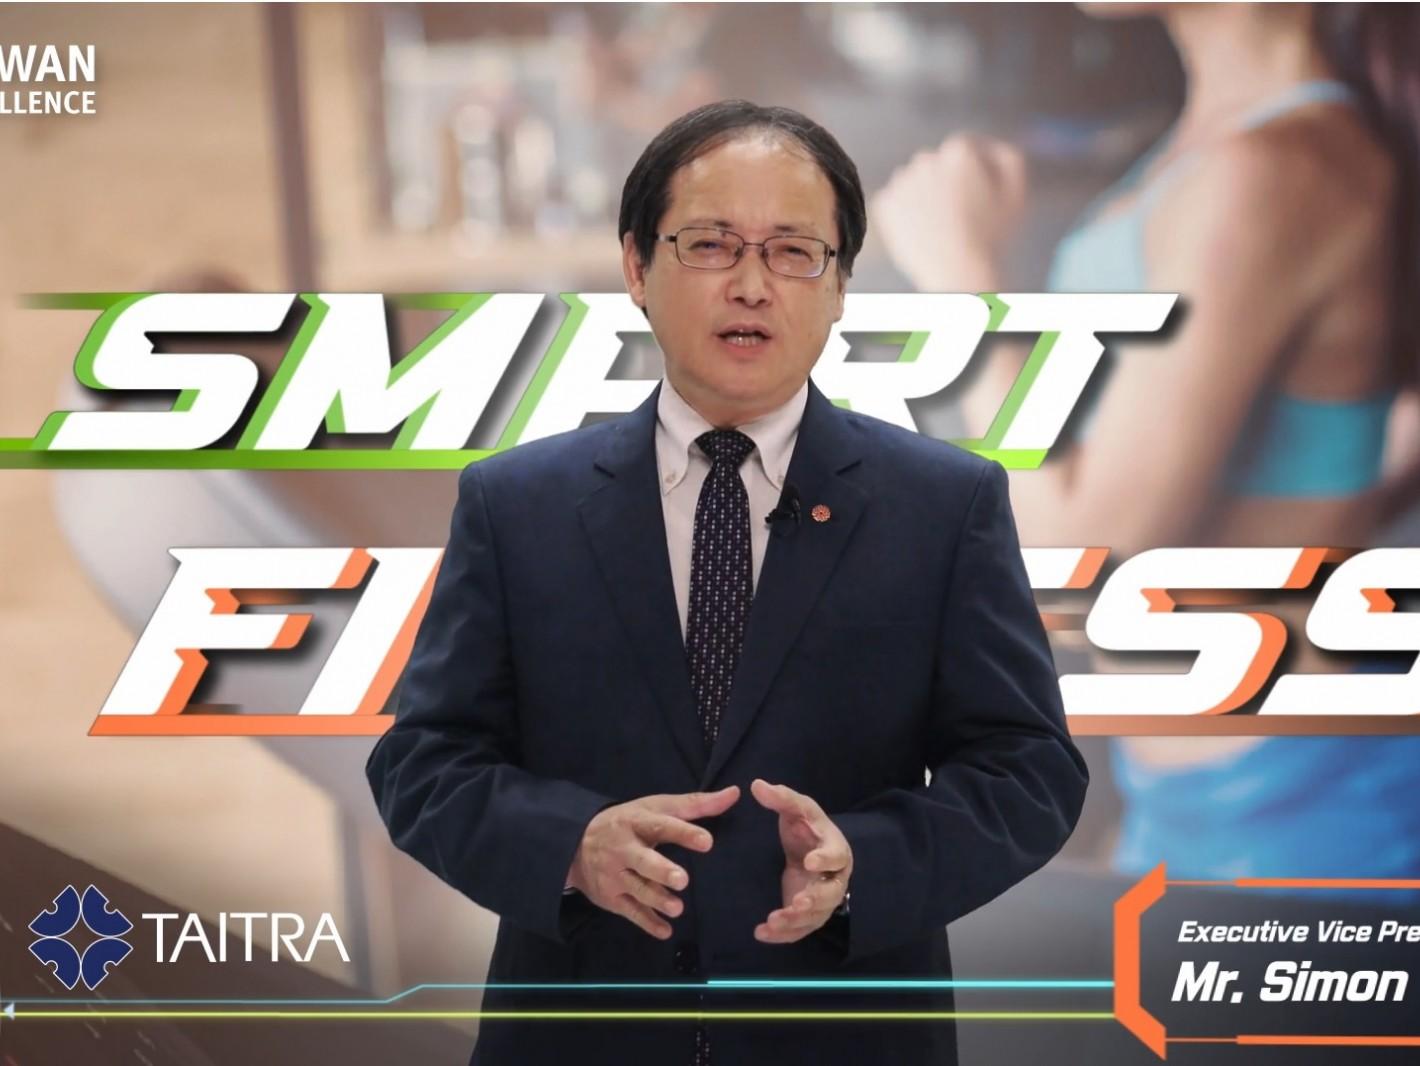 Executive Vice President of TAITRA-Mr. Simon Wang